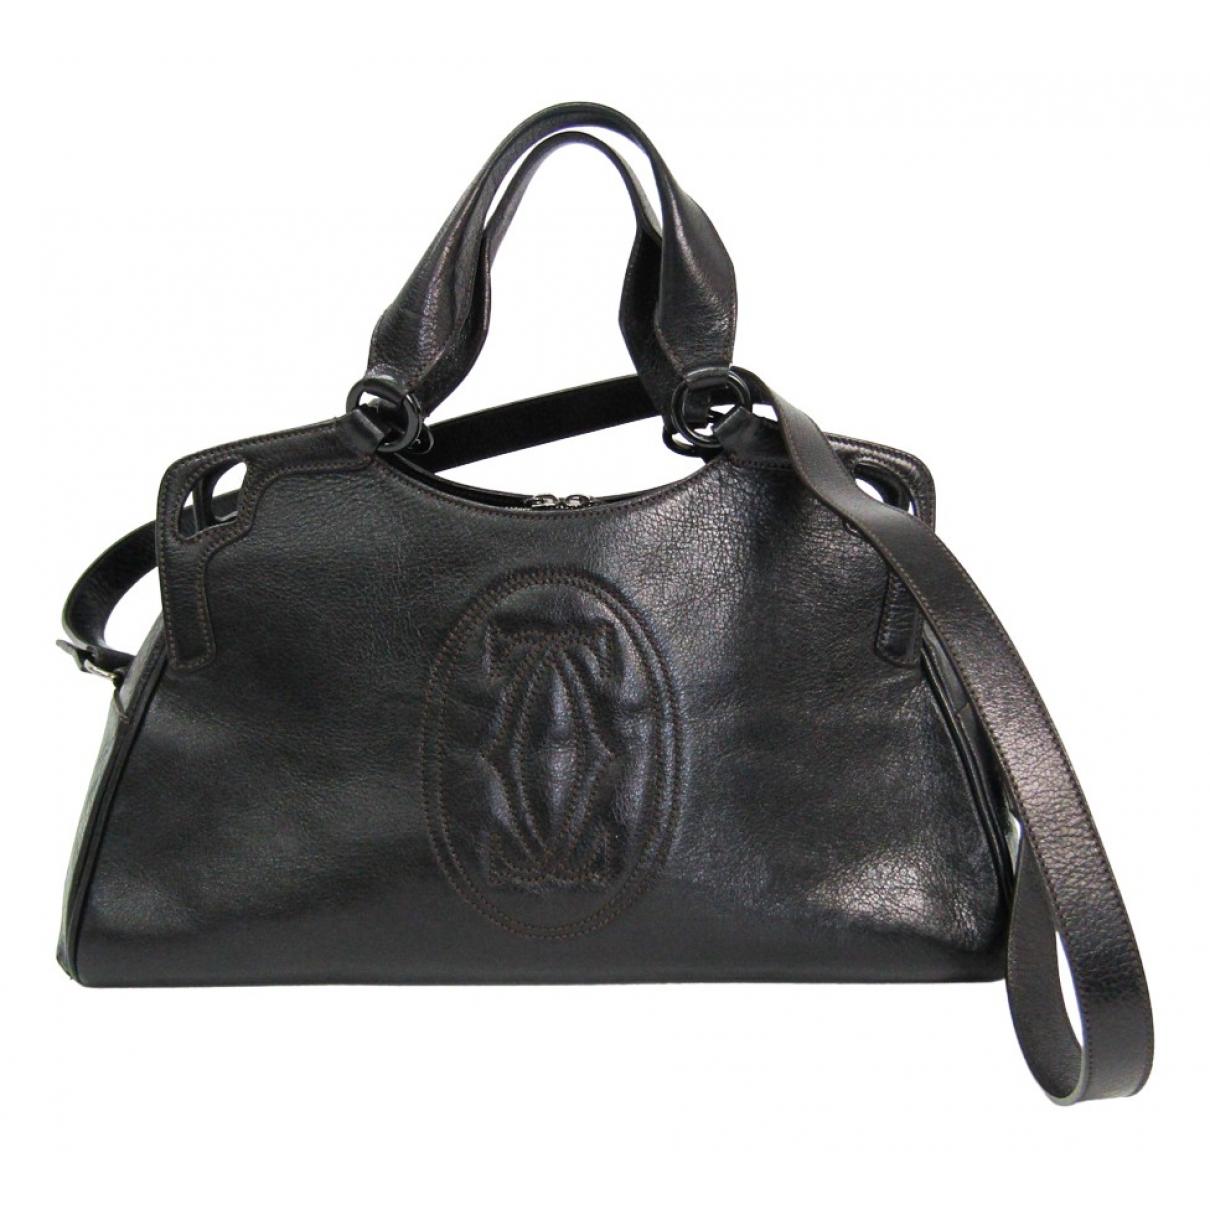 Cartier Marcello Black Leather handbag for Women N